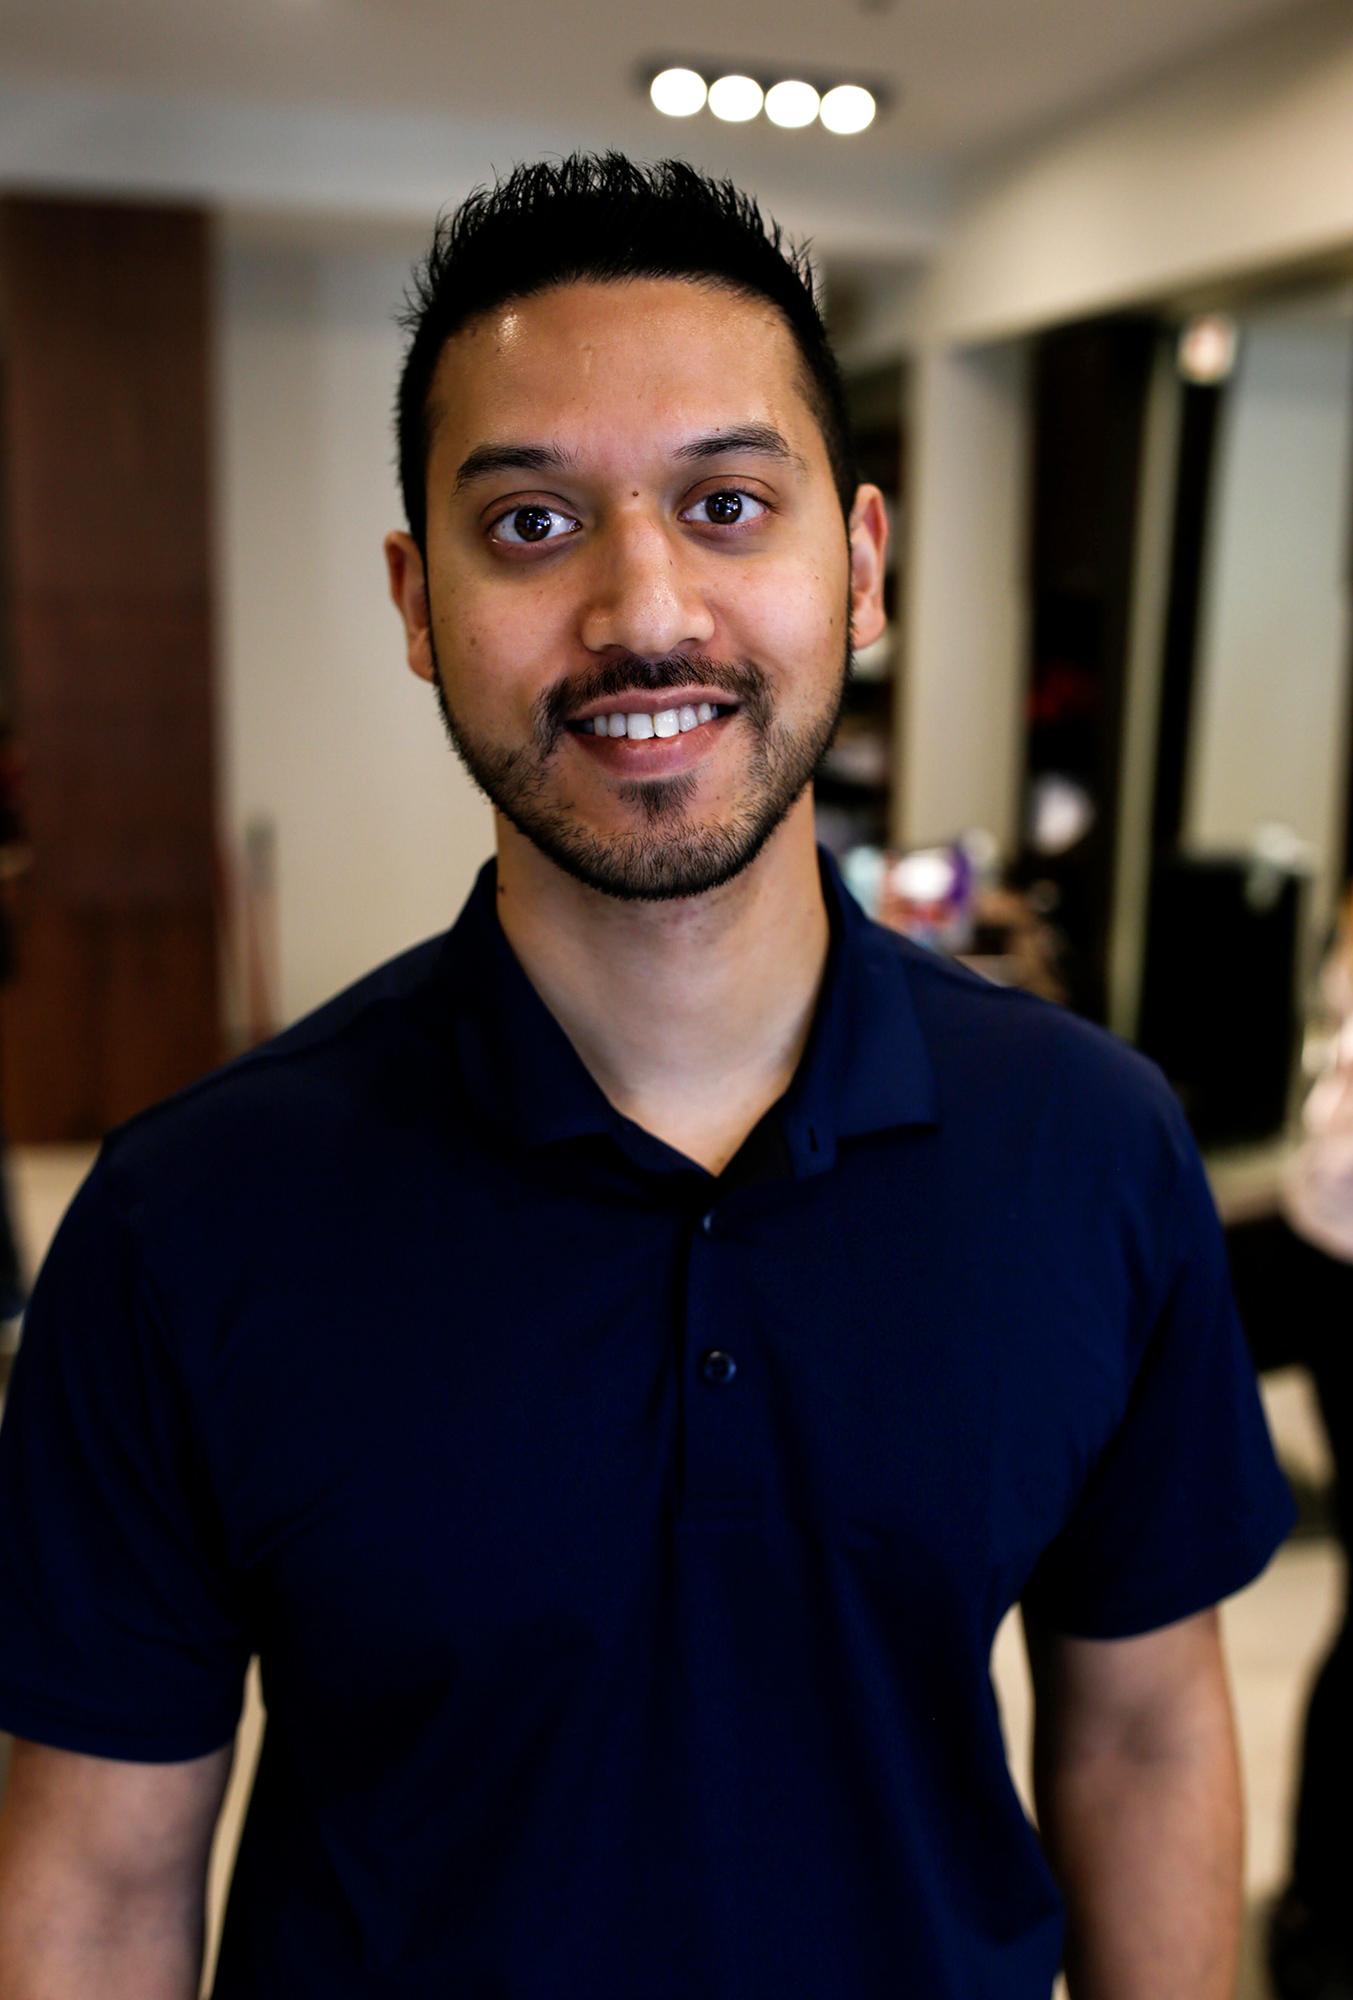 Sunil Pullukat / Chiropractor